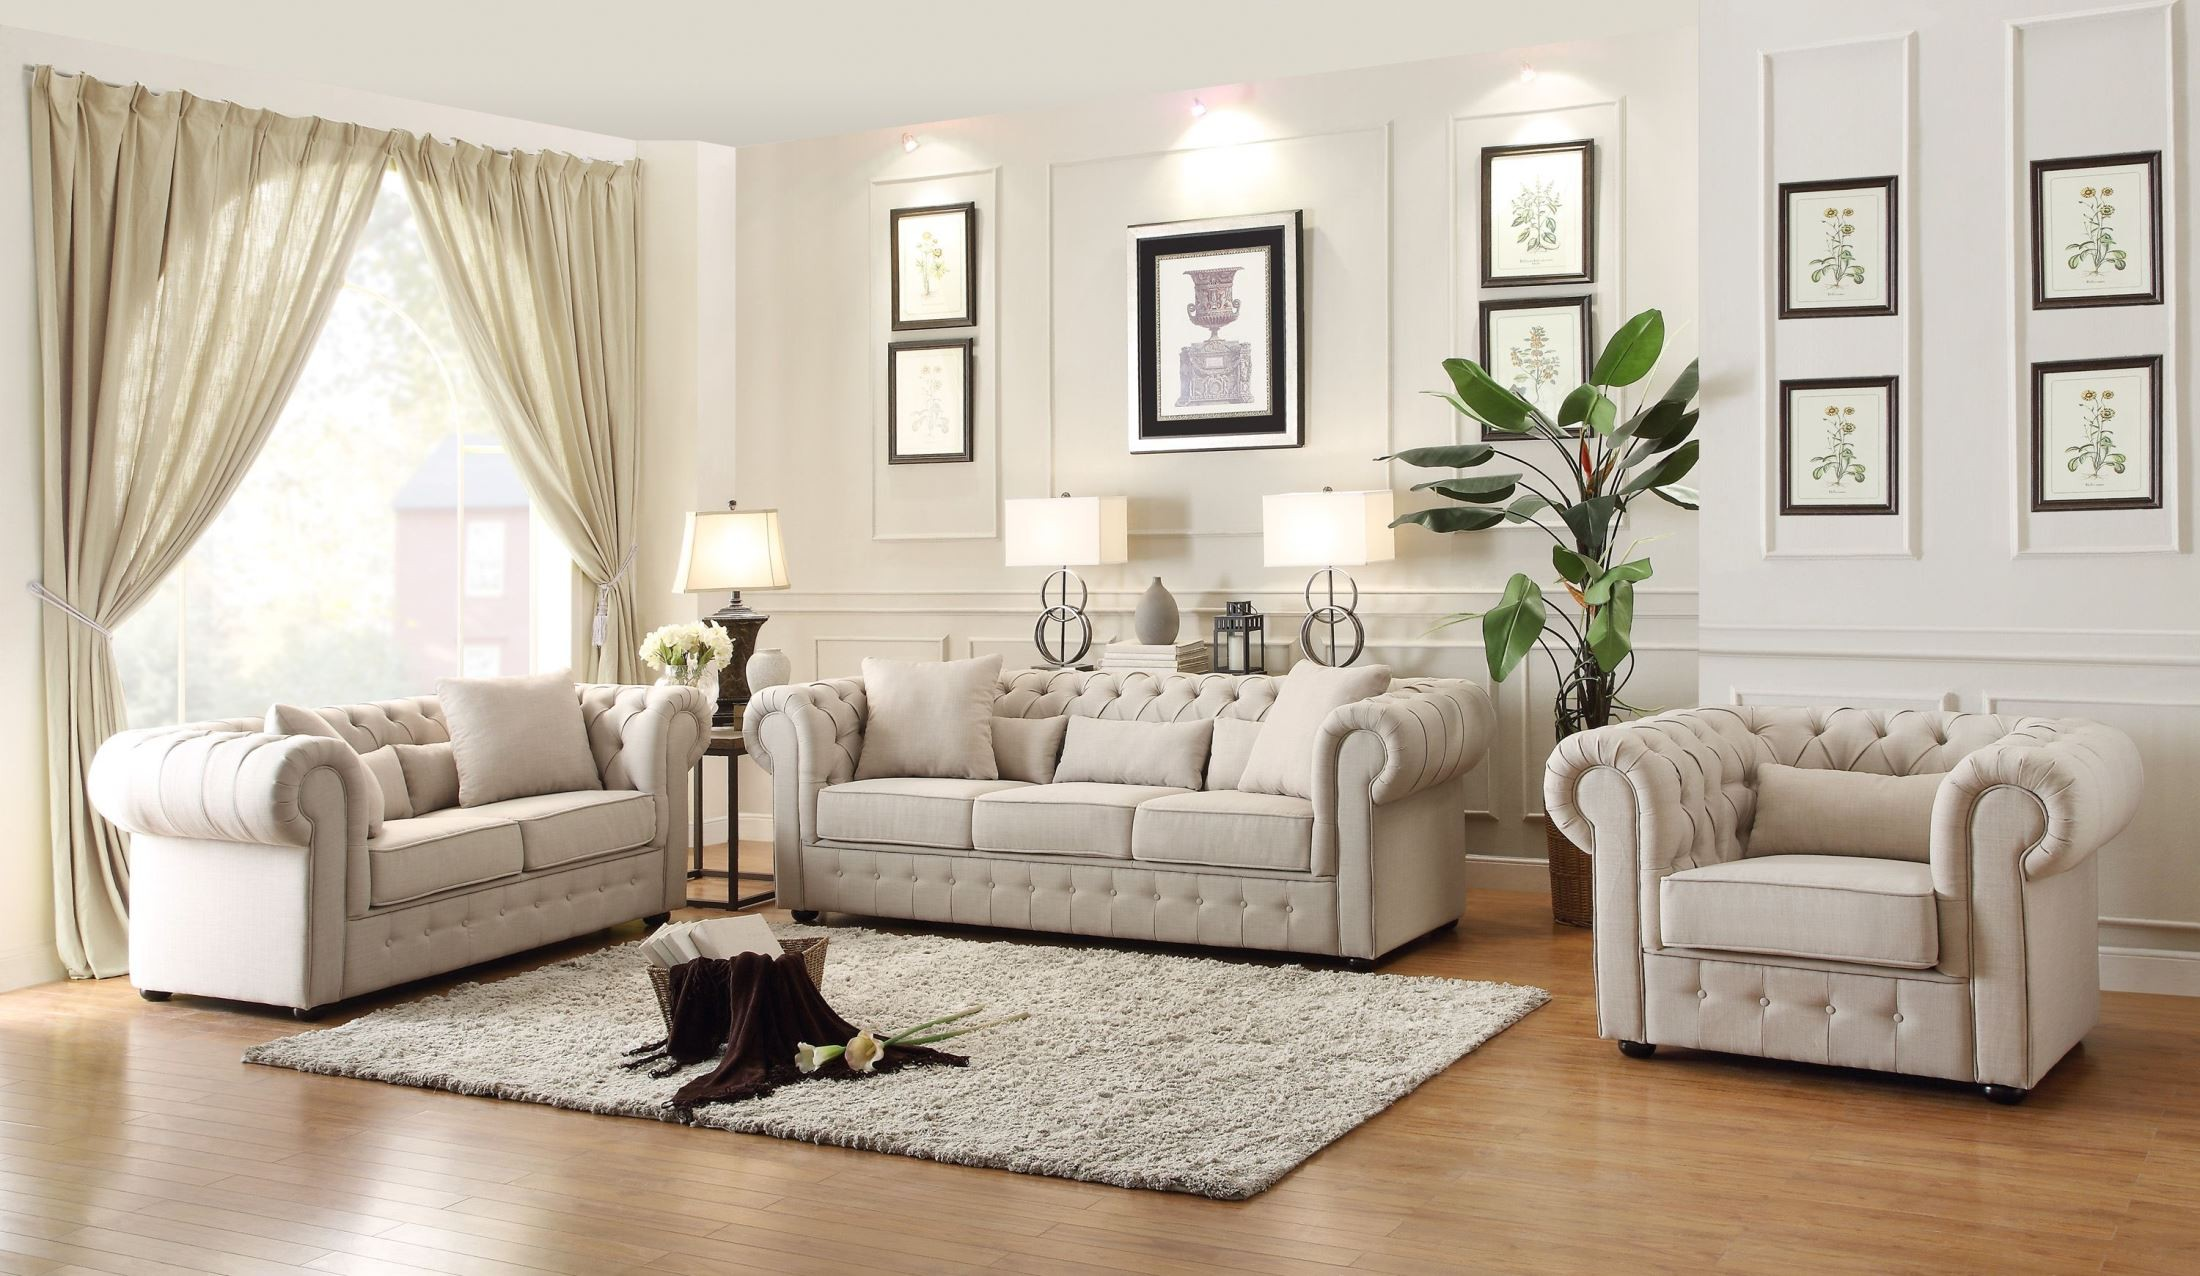 Rooms: Savonburg Natural Tone Living Room Set From Homelegance